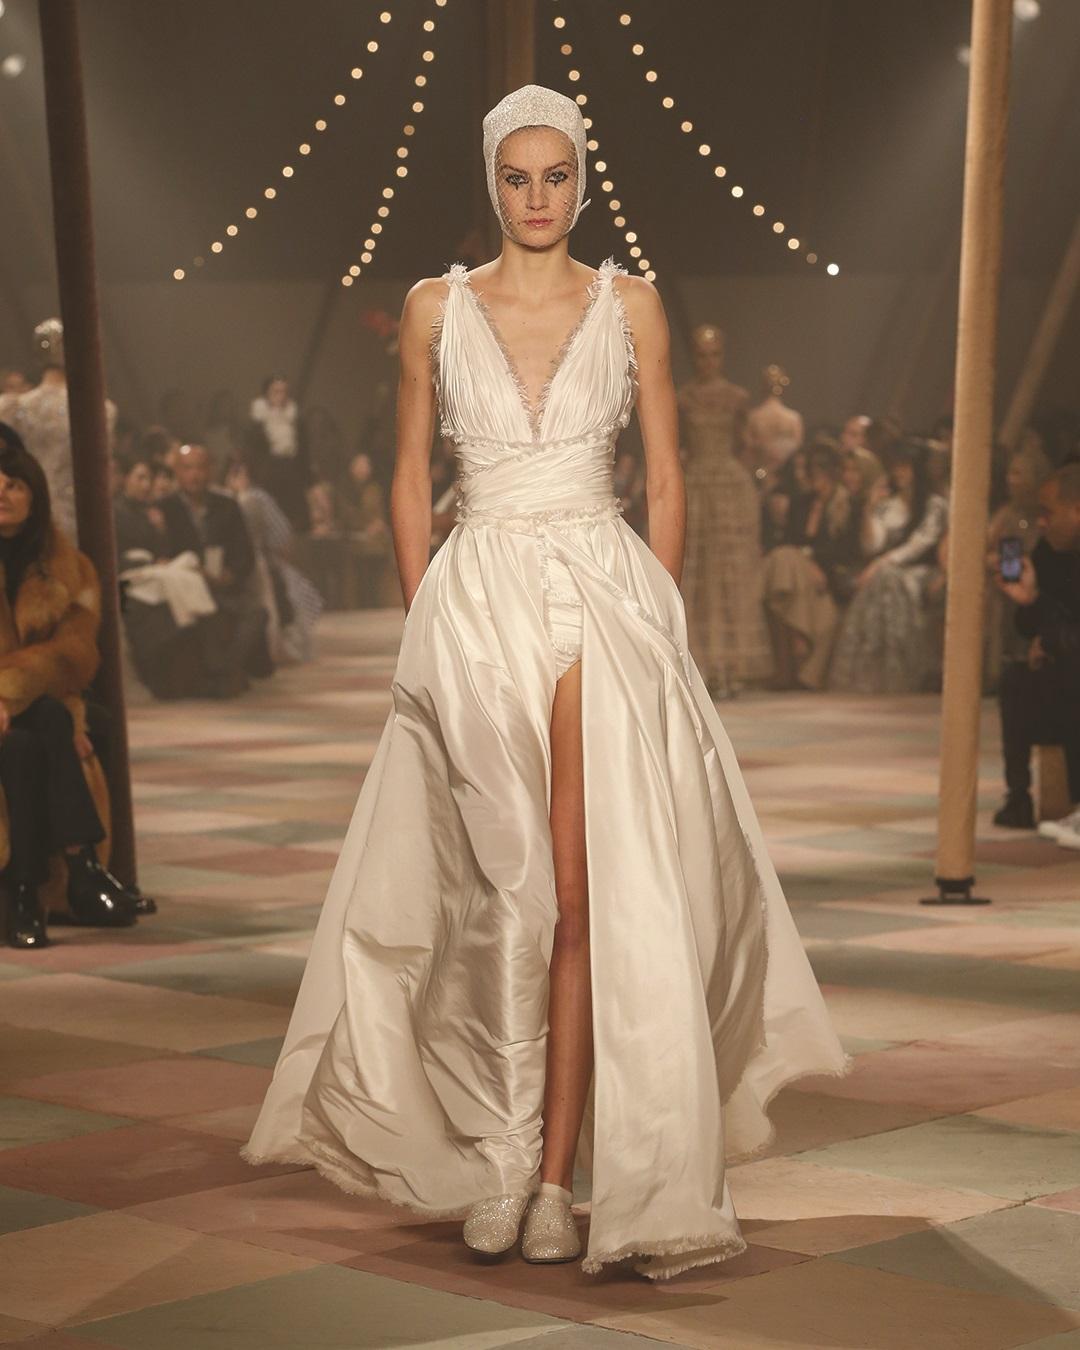 5. kép: Christian Dior